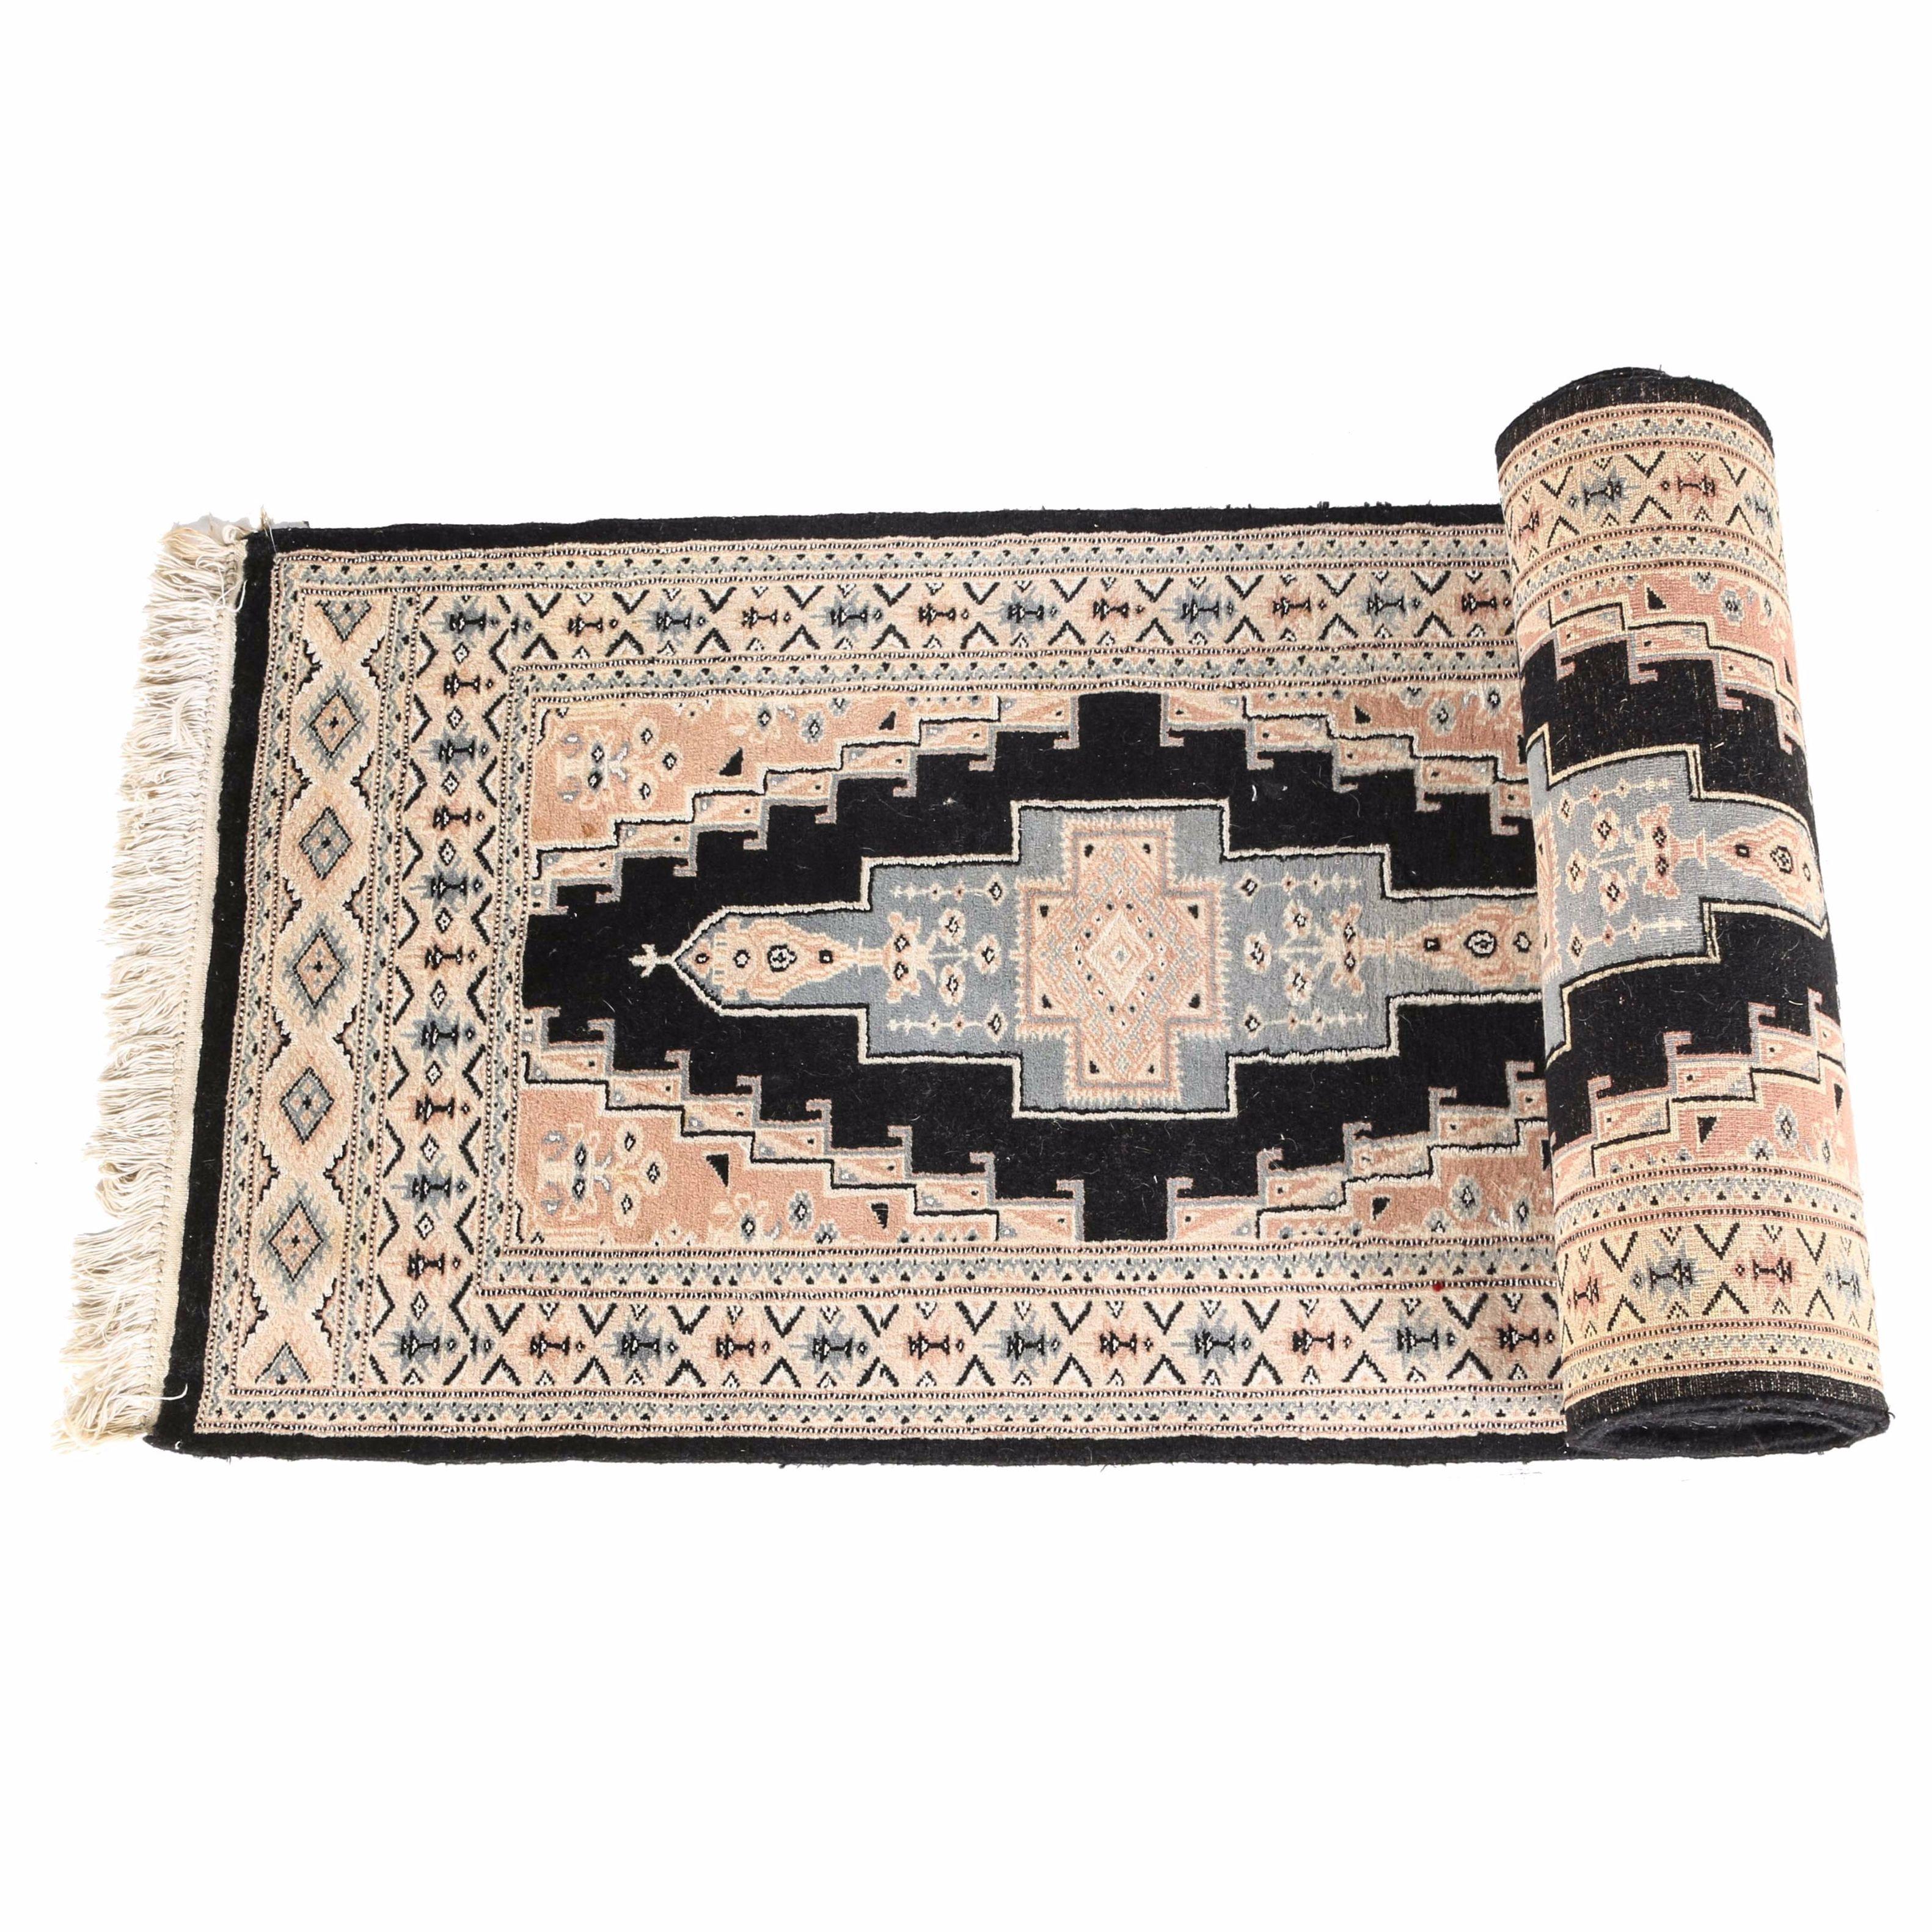 Hand-Knotted Wool Pakistani Kafkaz Carpet Runner